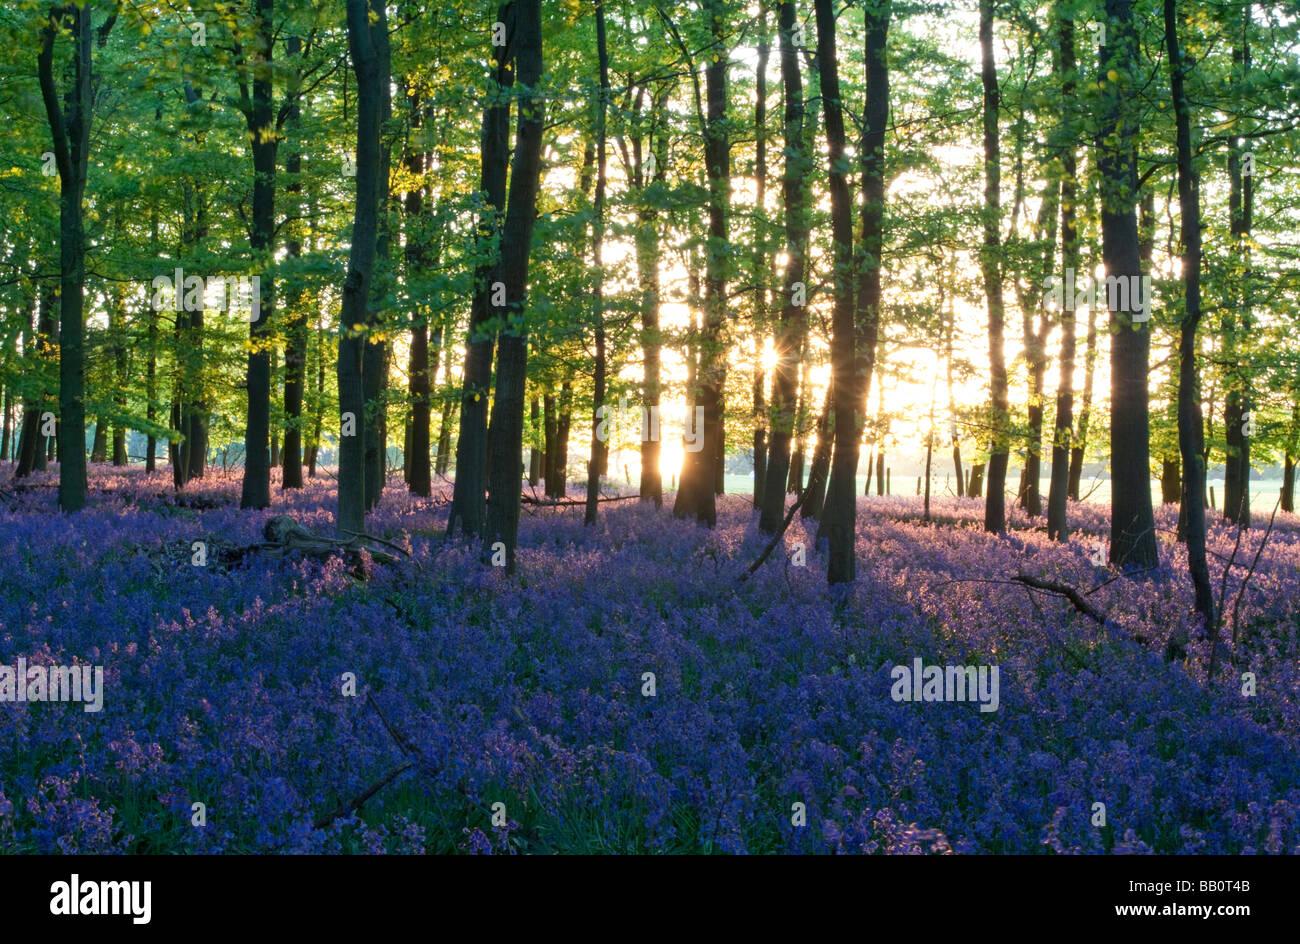 Ashridge Woods Bluebells - Buckinghamshire - Stock Image